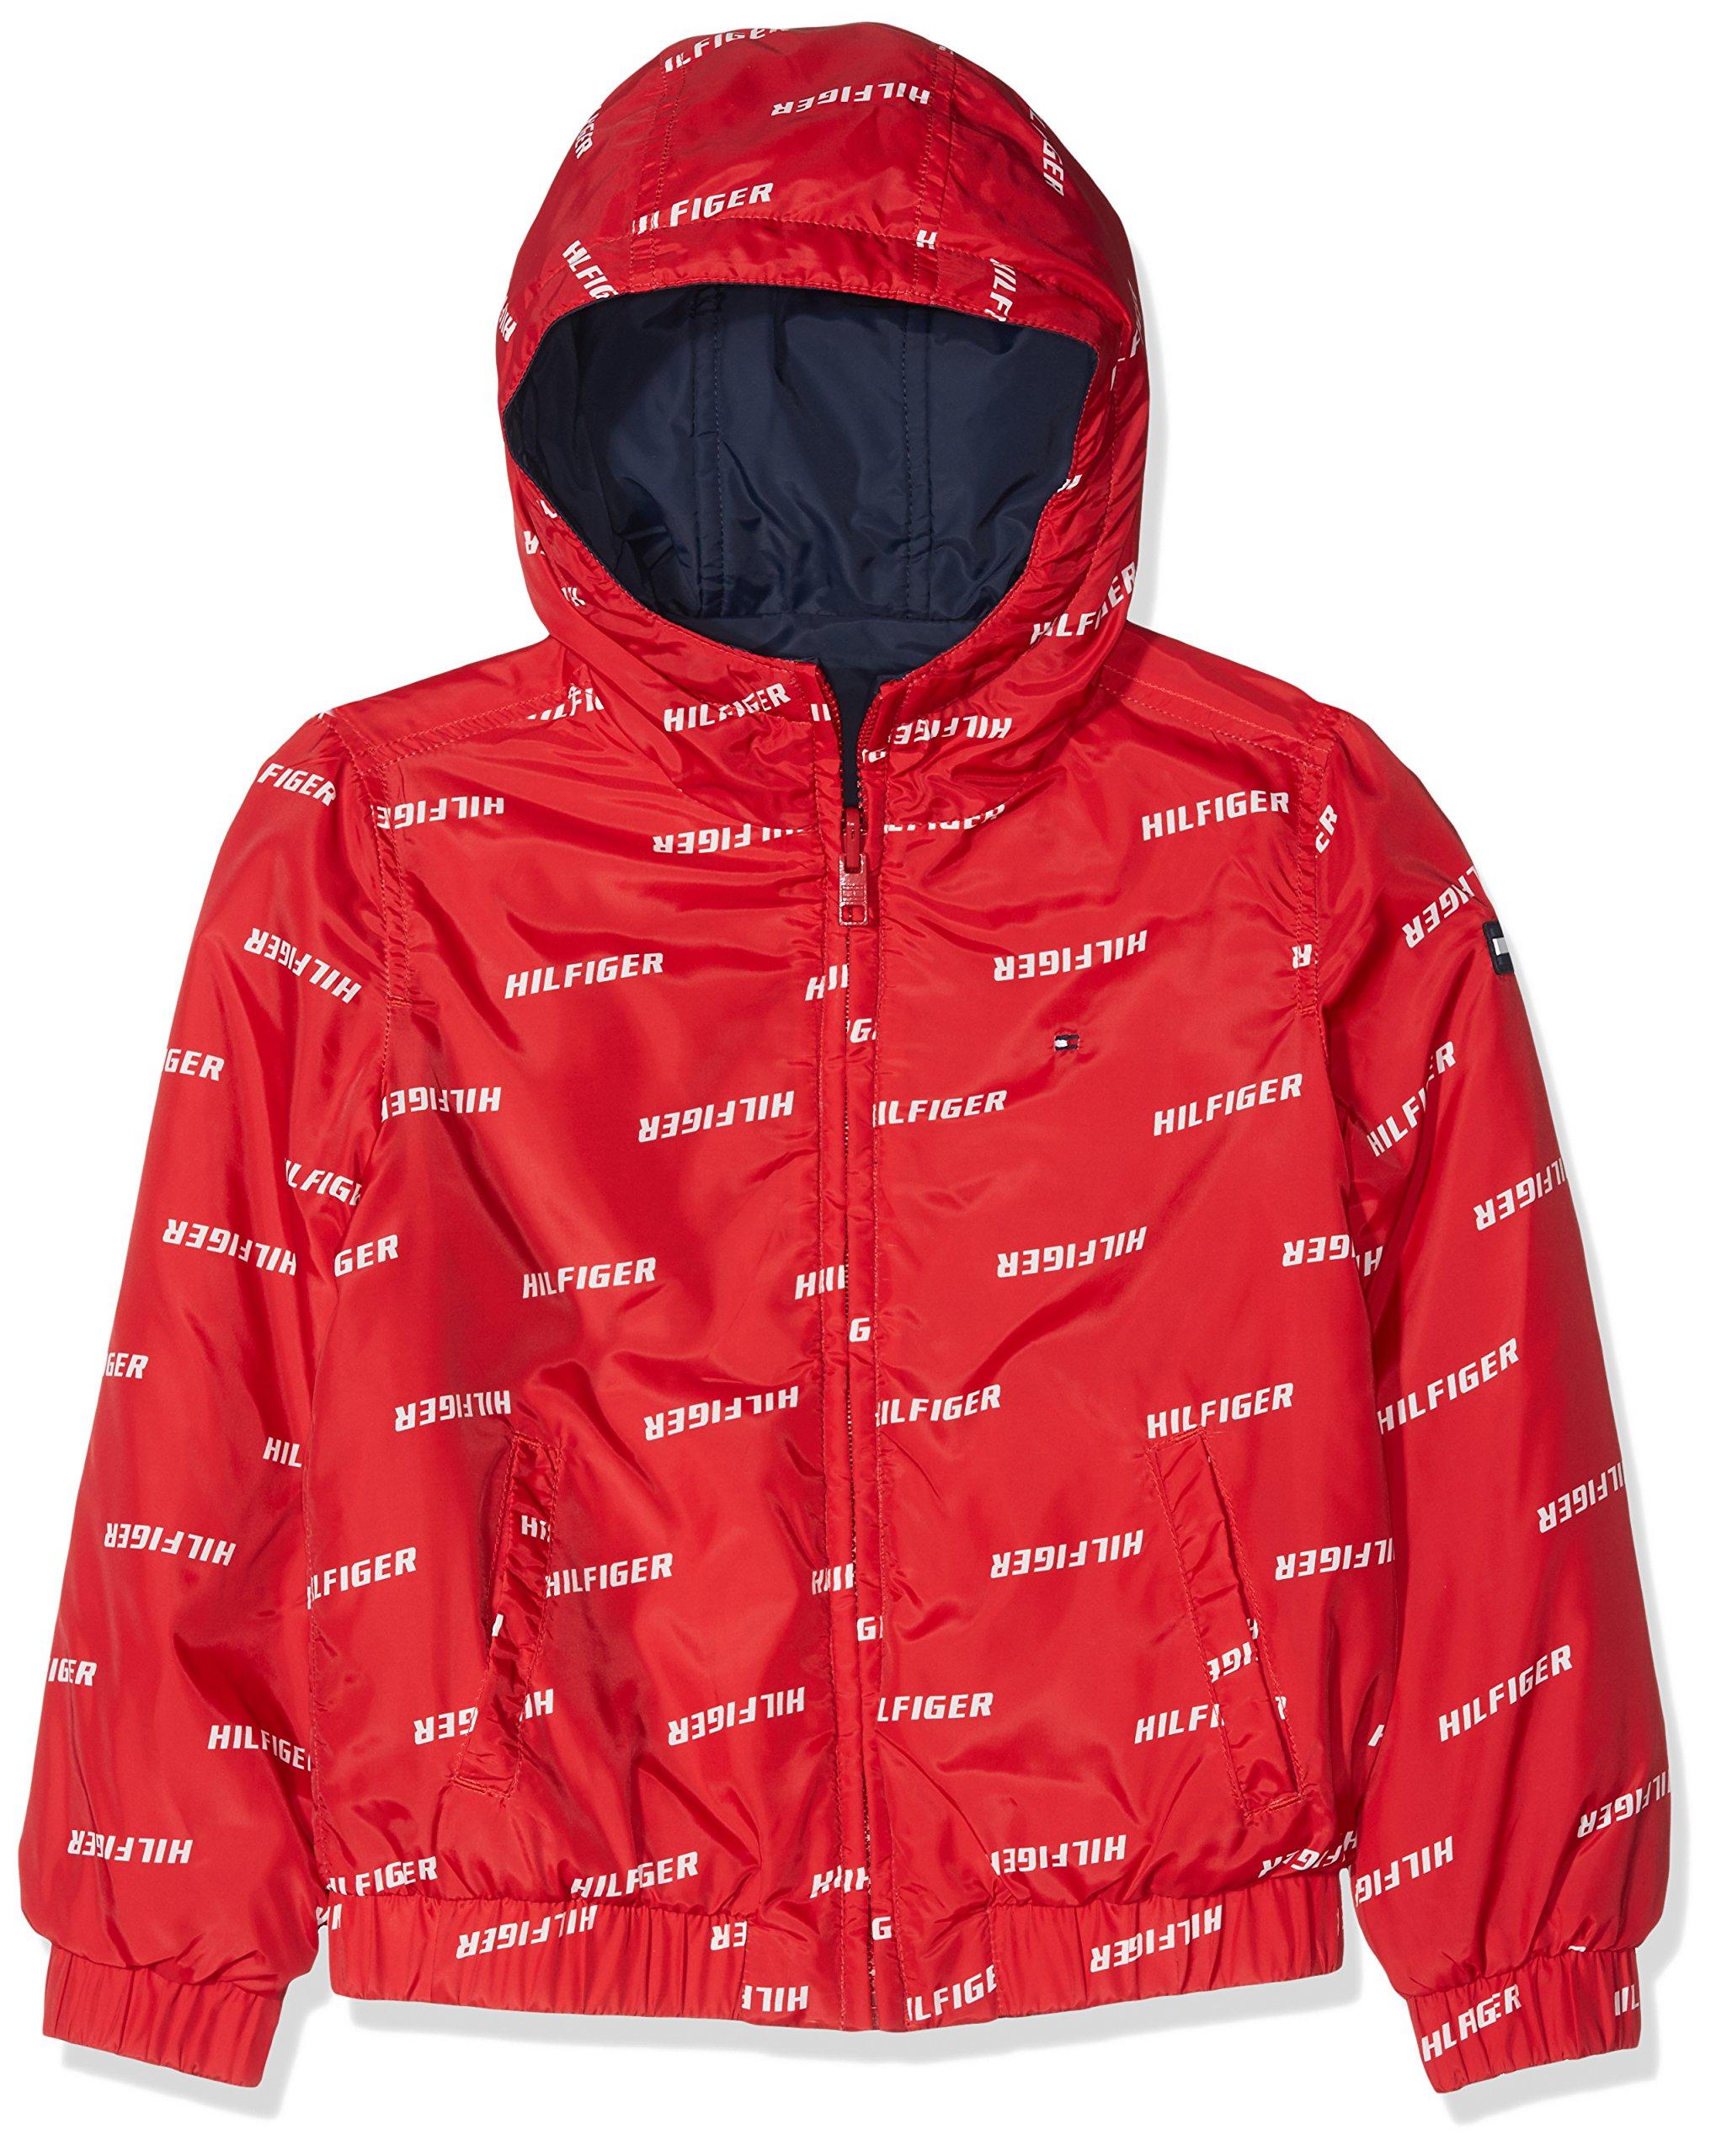 Tommy Hilfiger Essential Reversible Hooded Jacket Chaqueta para Niños